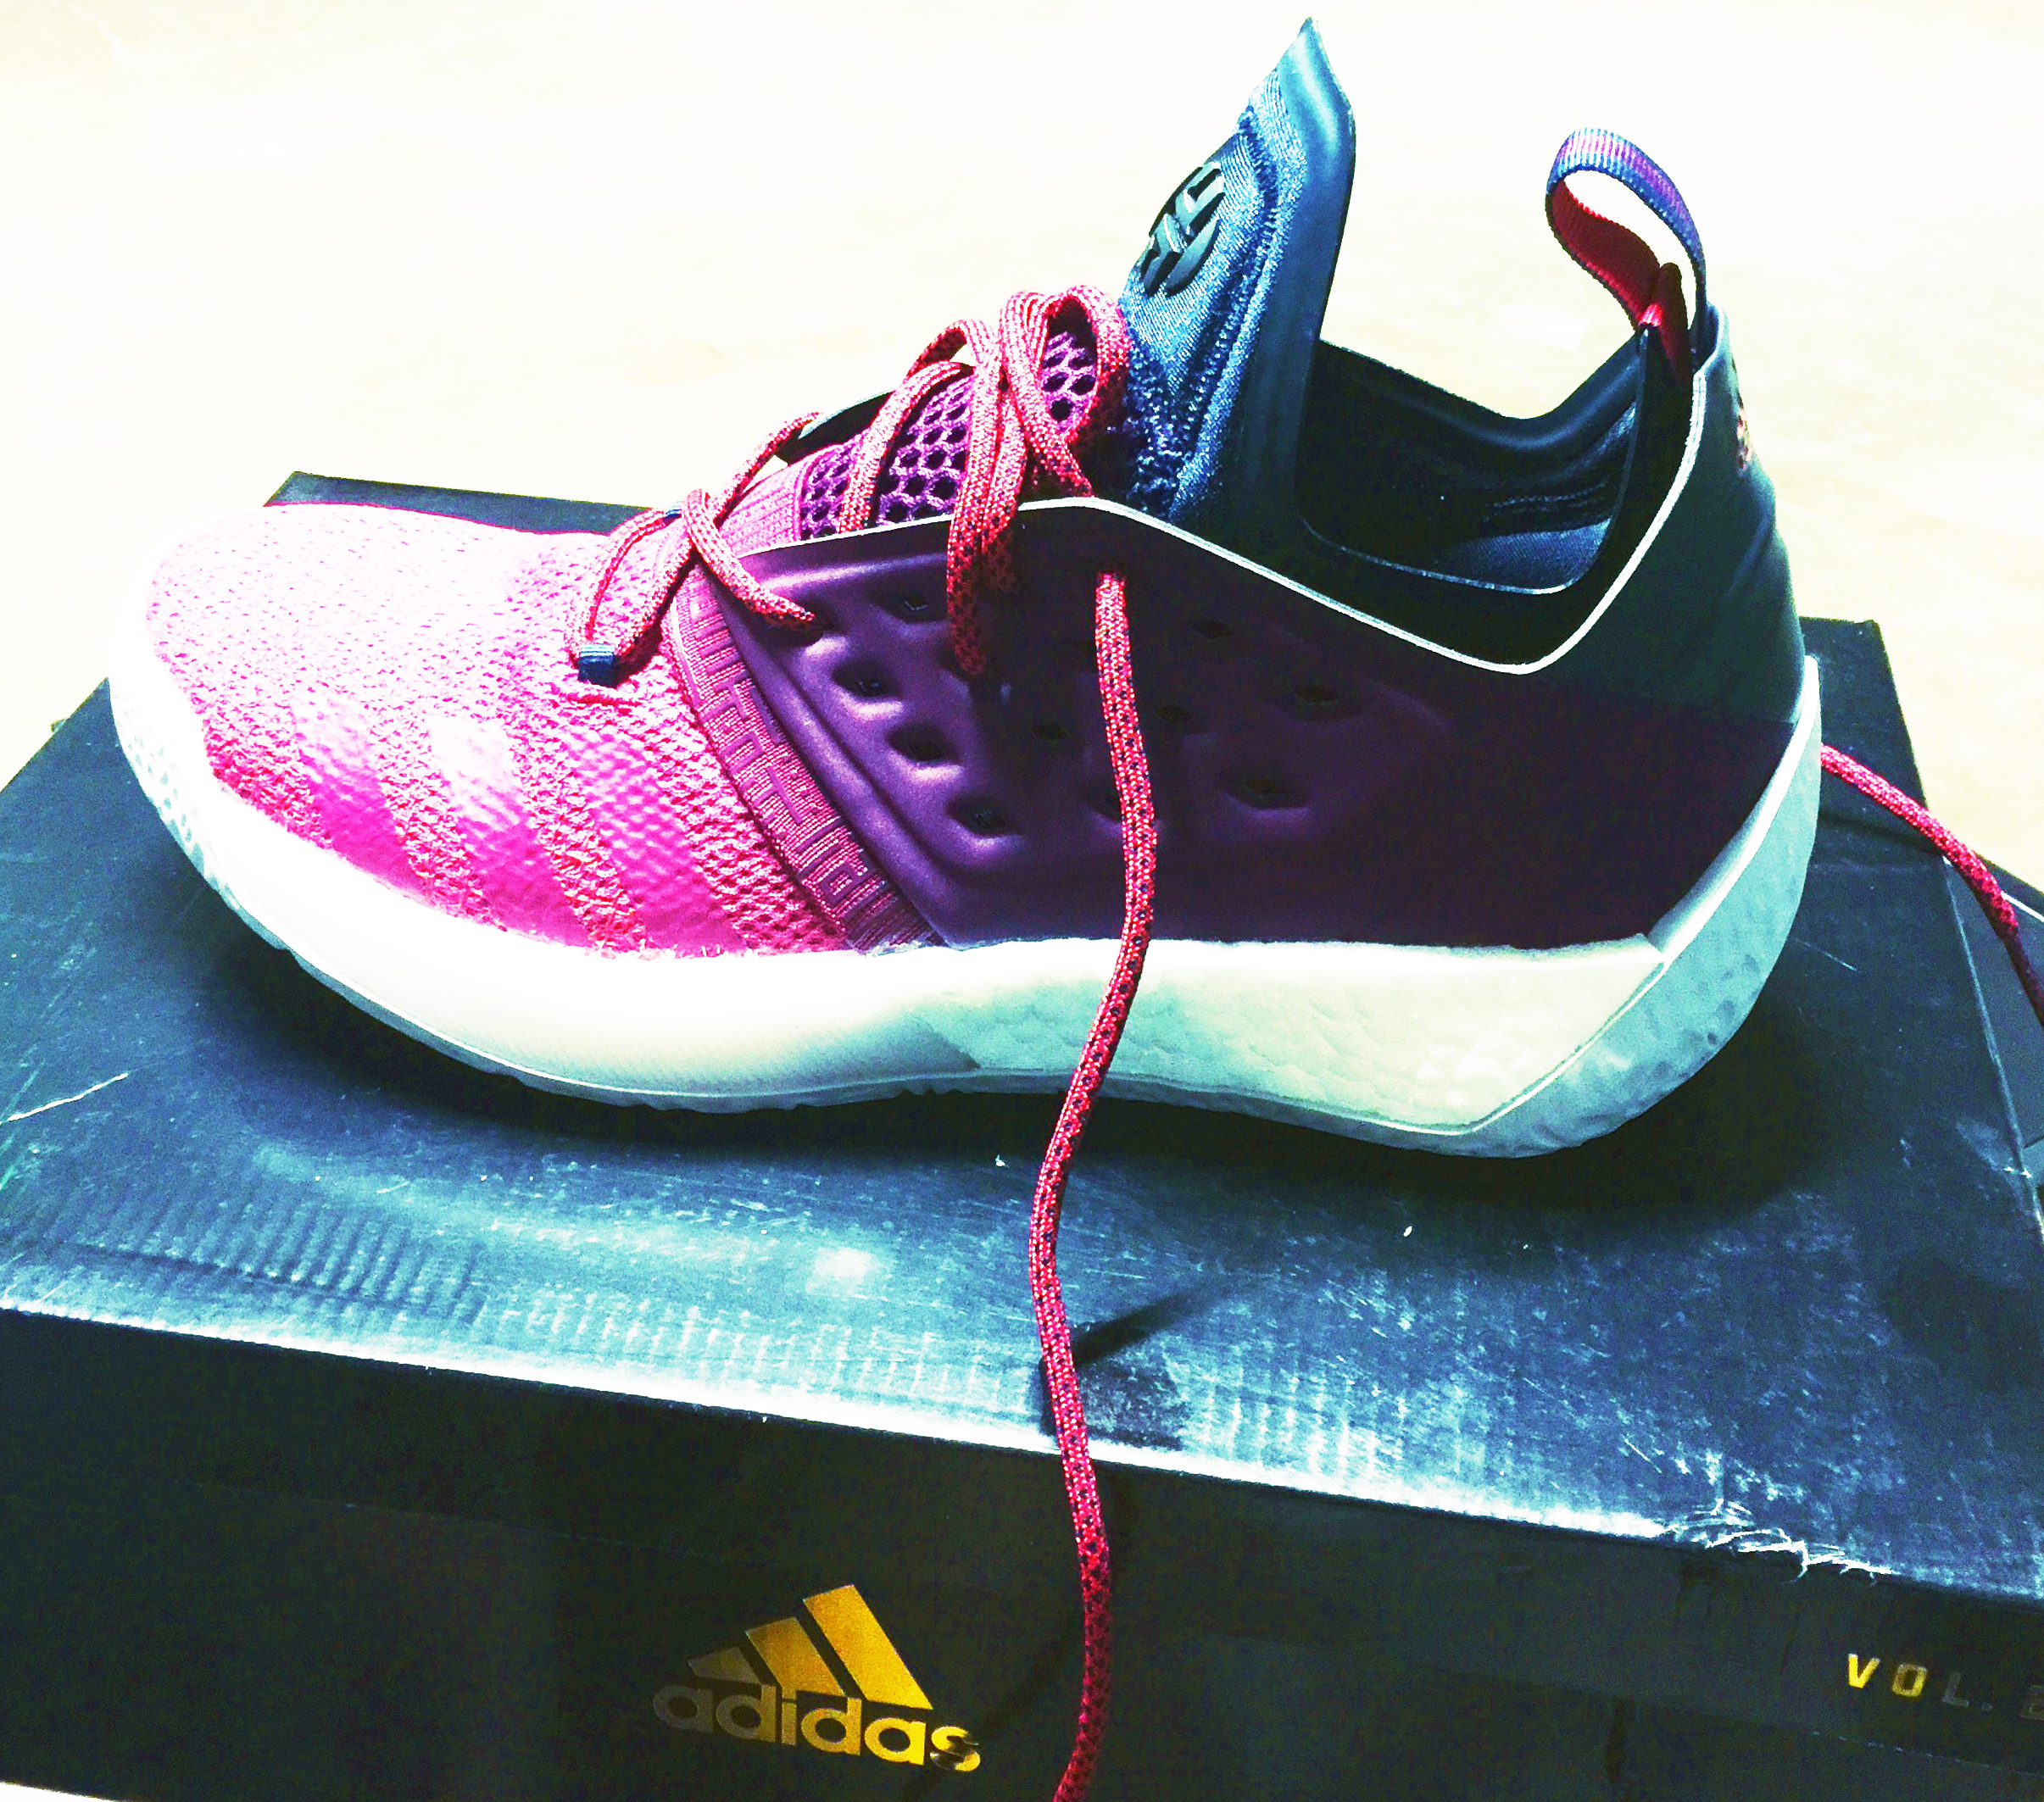 adidas, NBA All Star, Cool Styles, Pharrell's Hot Performance In LA